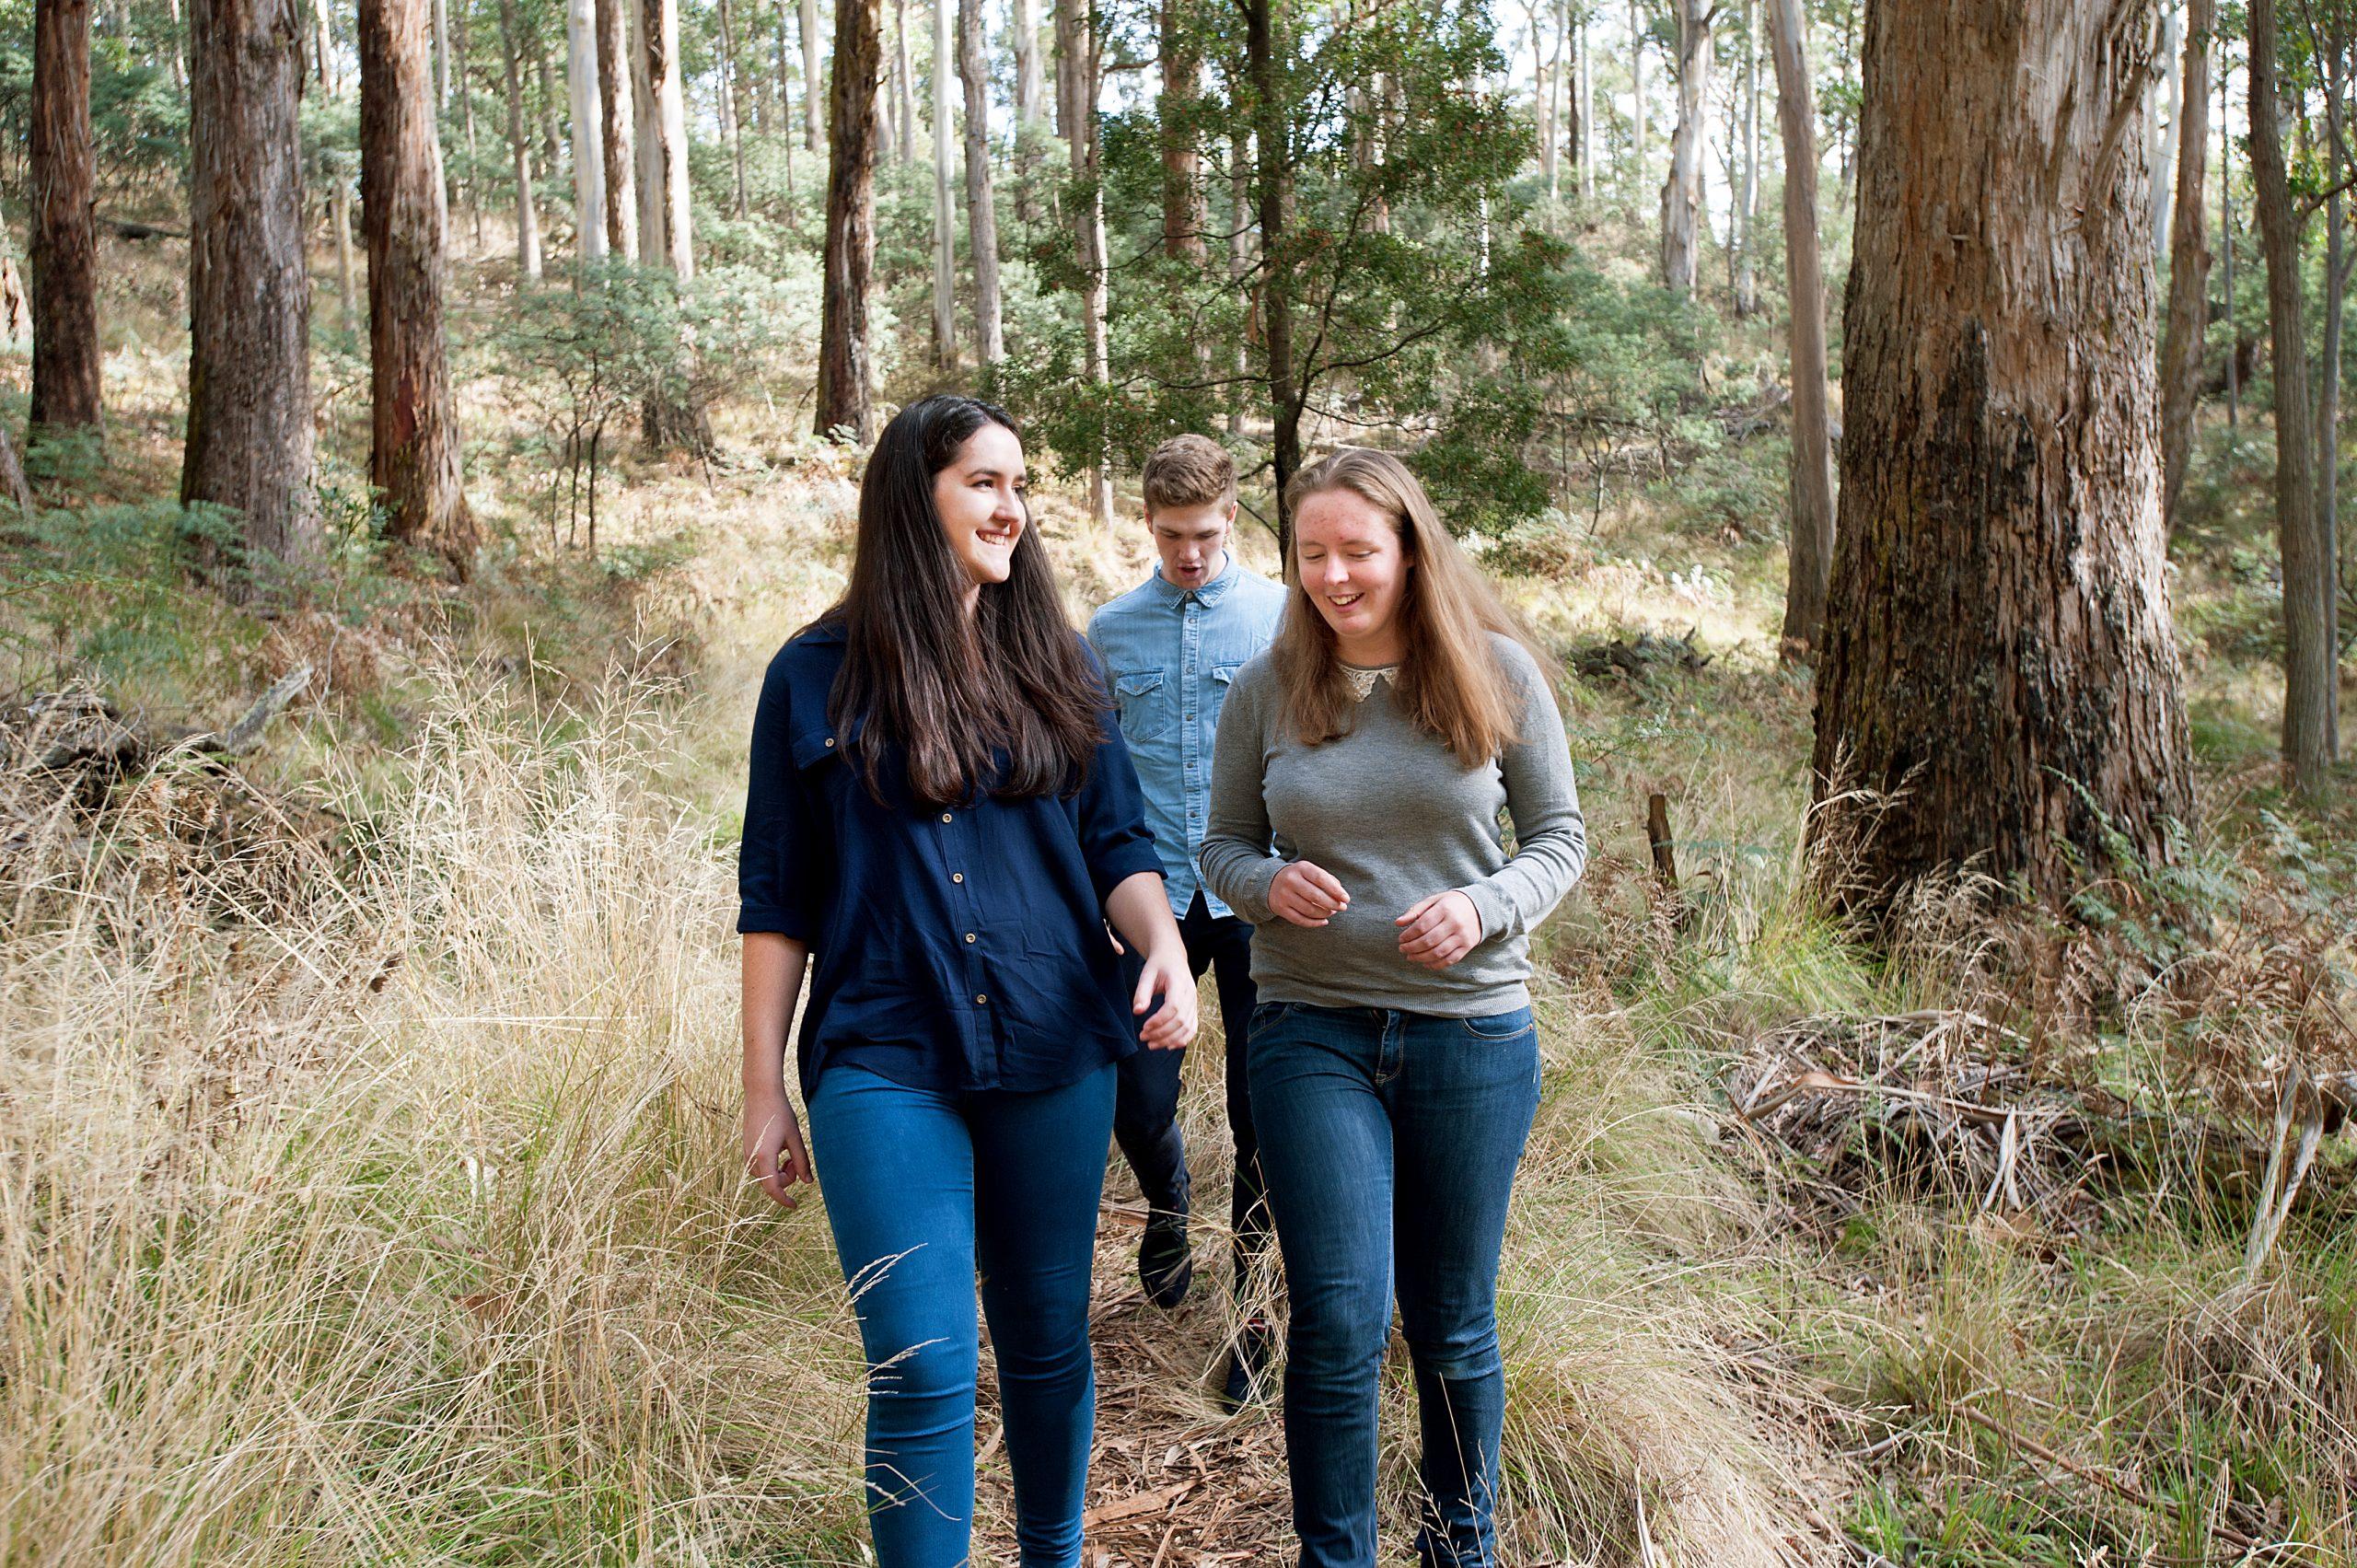 Kate Maddern and friends bush walking